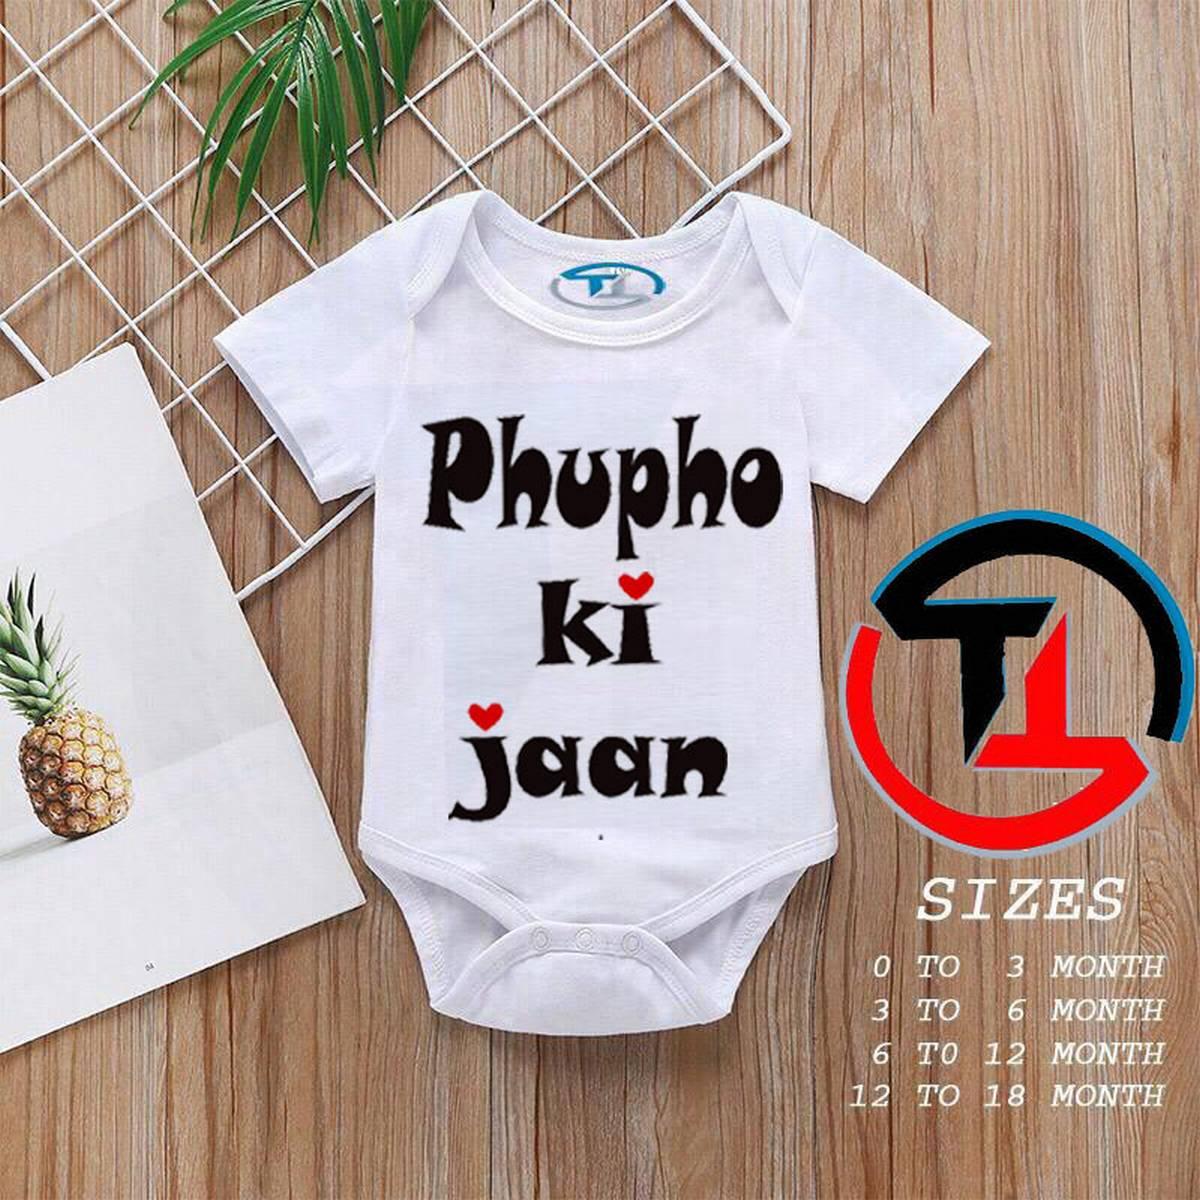 Baby Girls and Boys Half Sleeves Cotton Body suits Summer Wear, Romper Infants Onesies (PHUPO KI JAN)